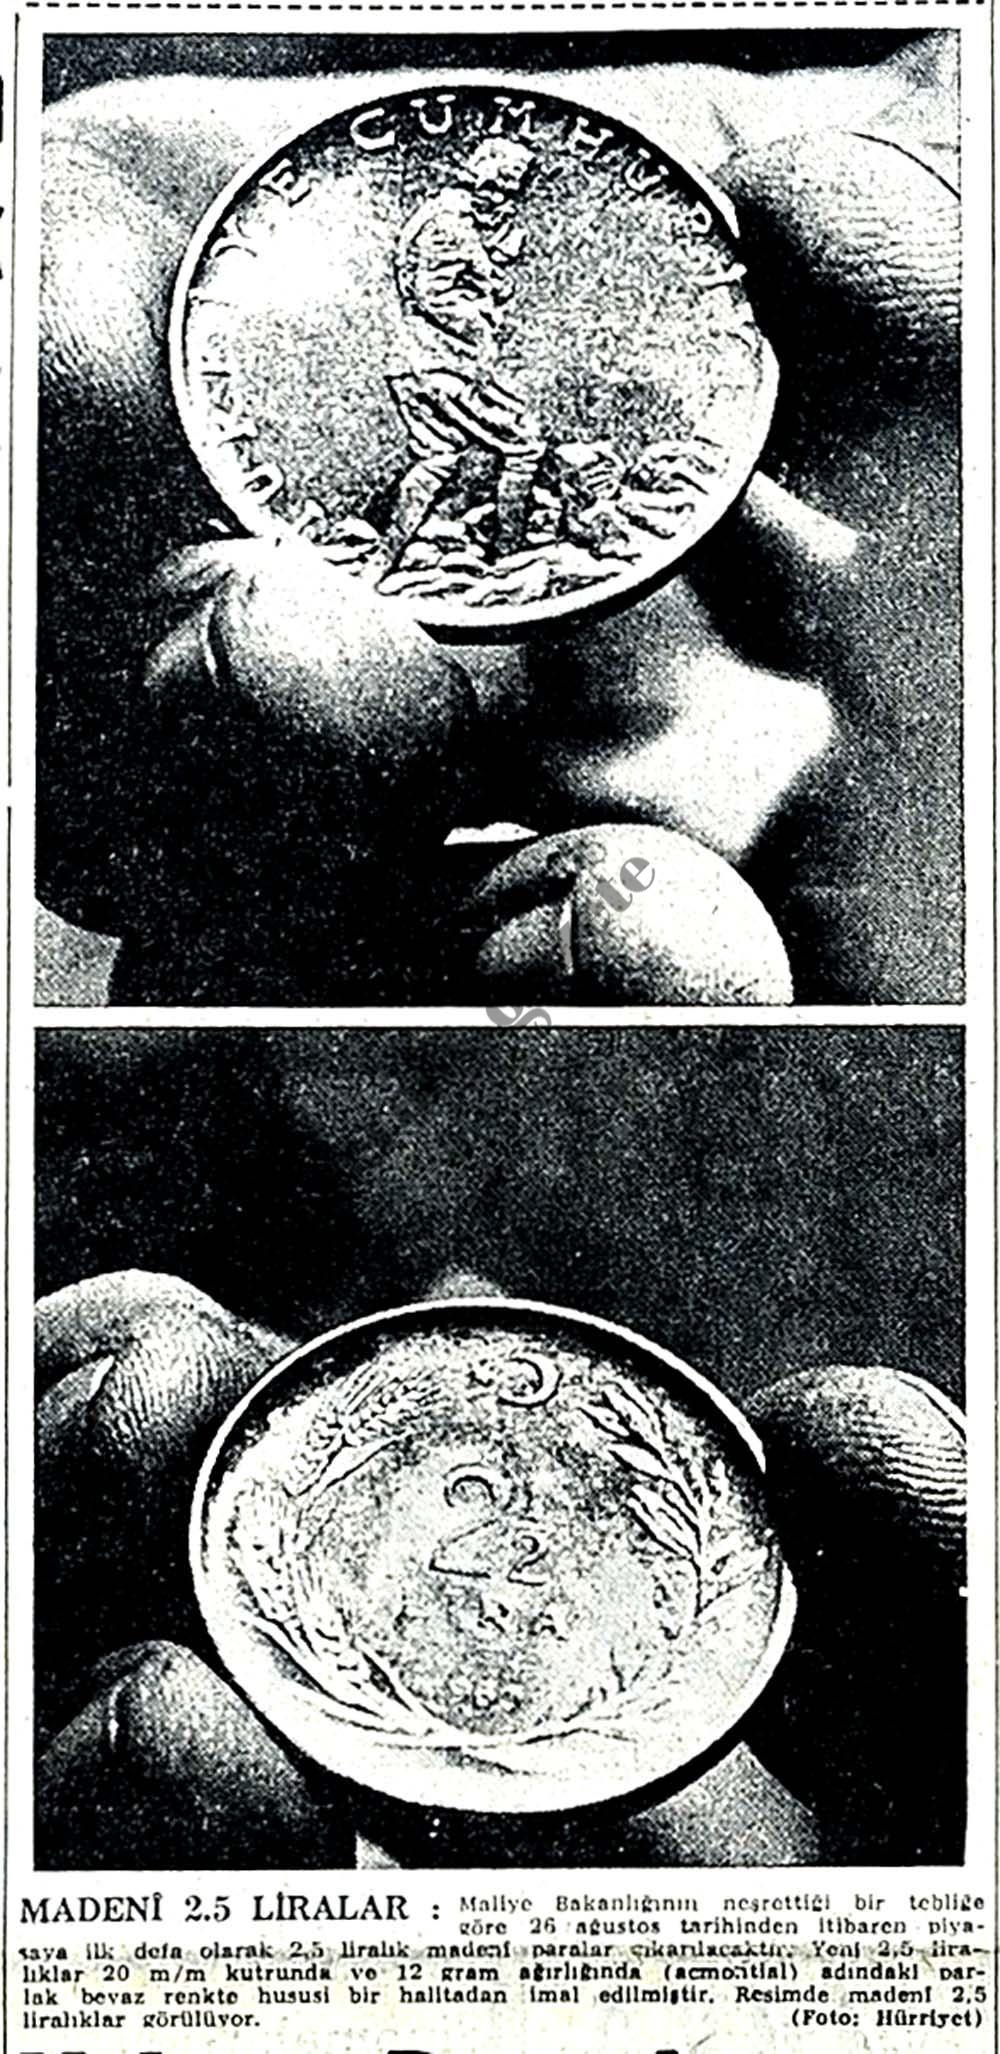 Madeni 2.5 liralar